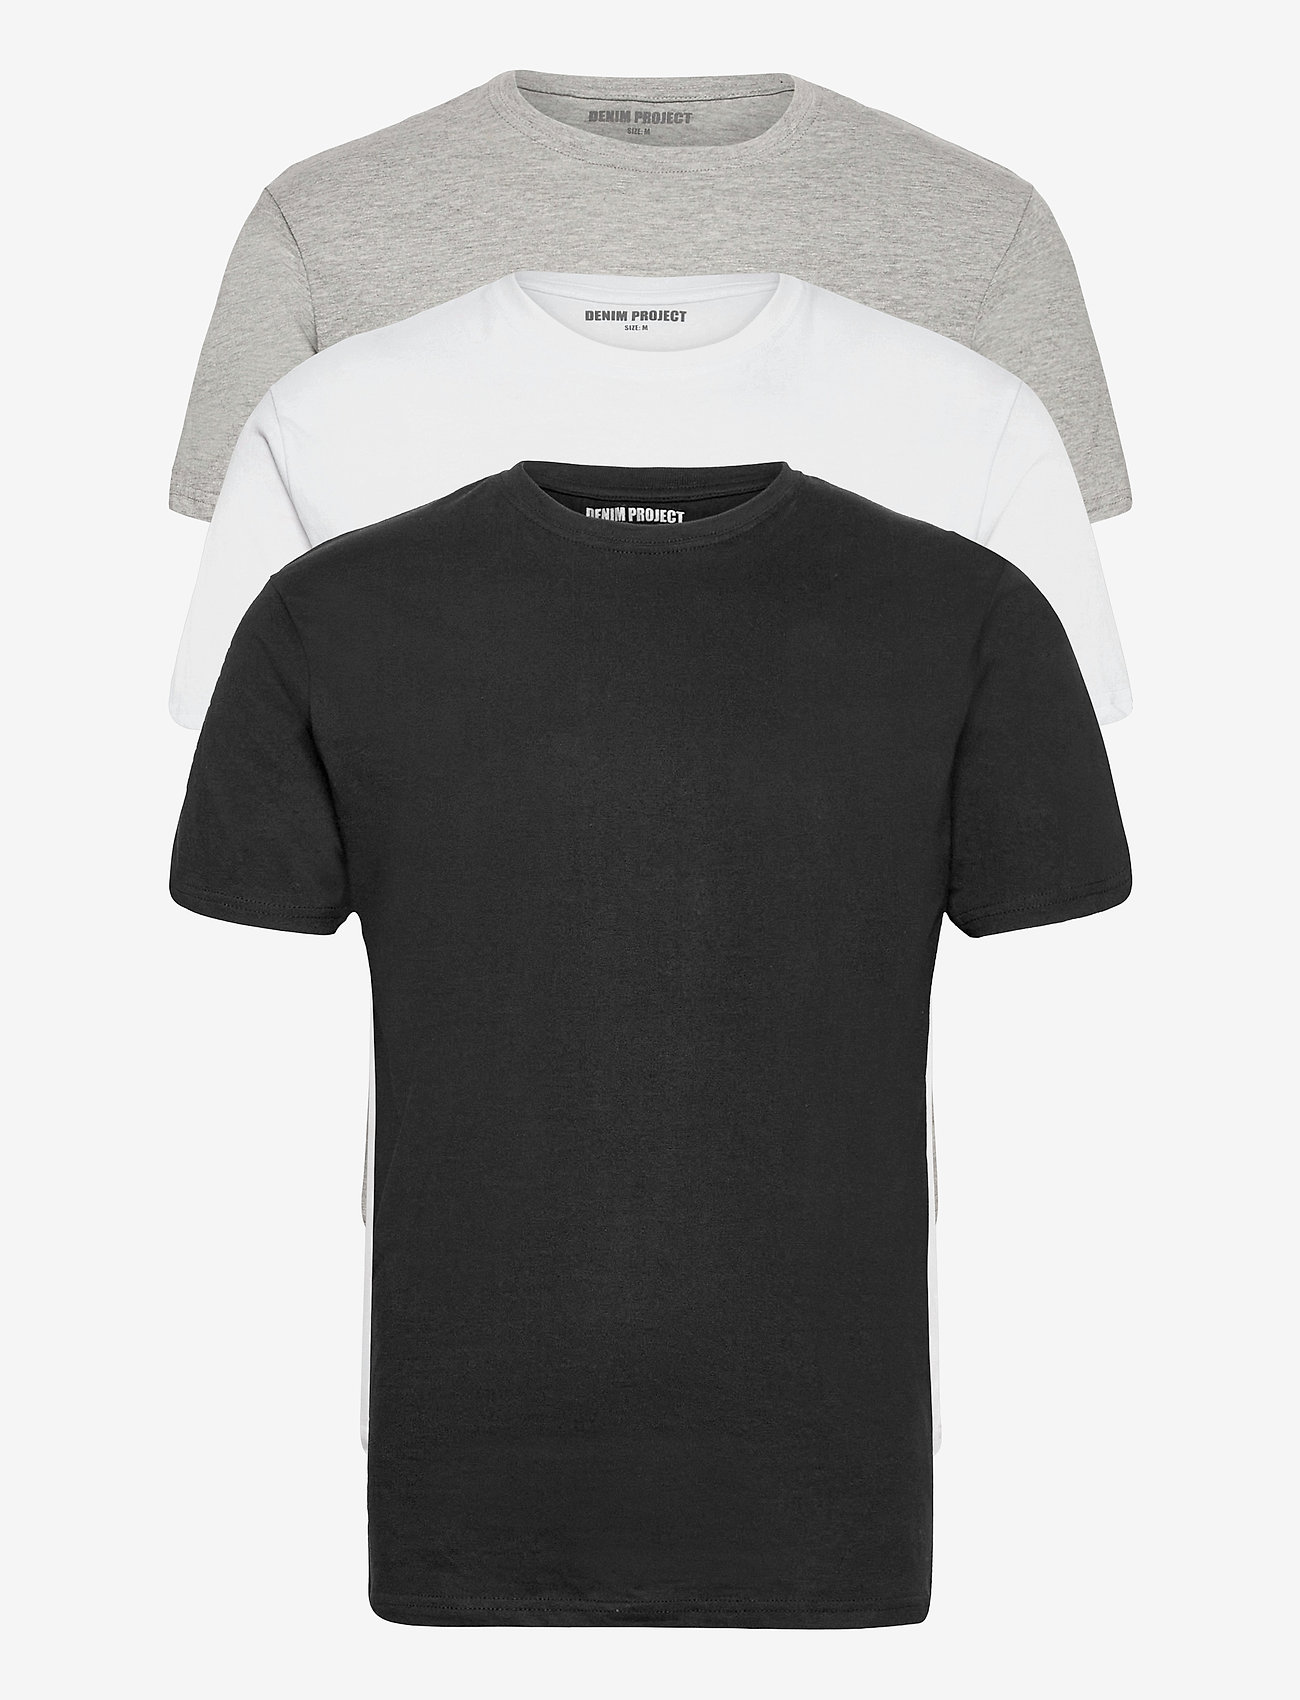 Denim project - 3 PACK T-SHIRTS - basic t-shirts - black/white/light grey melange - 0